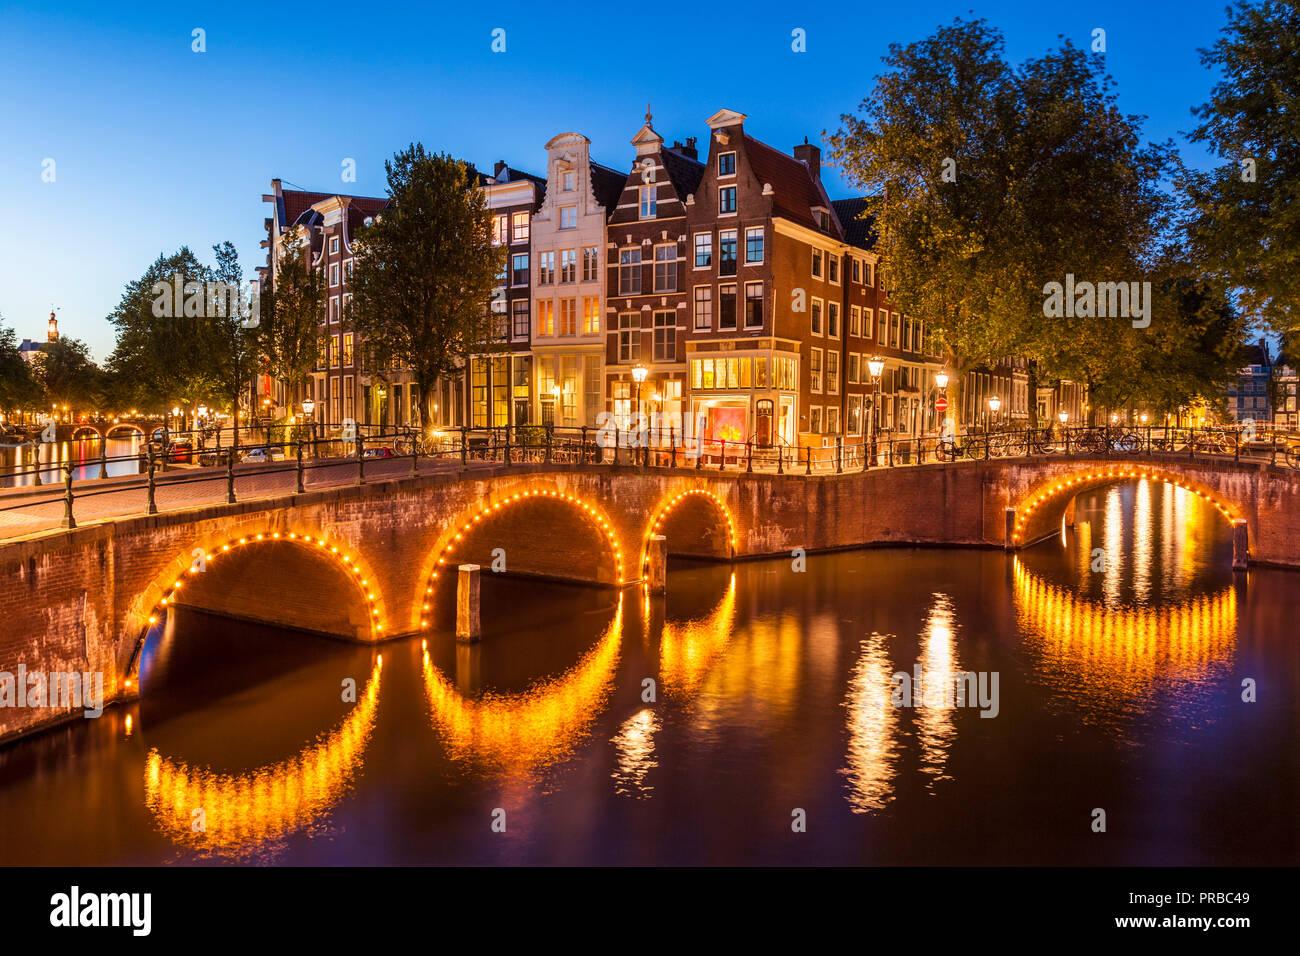 Amsterdam canal illuminato ponti sul canale Keizersgracht e Leidsegracht canal canali di Amsterdam Olanda Paesi Bassi EU Europe Foto Stock